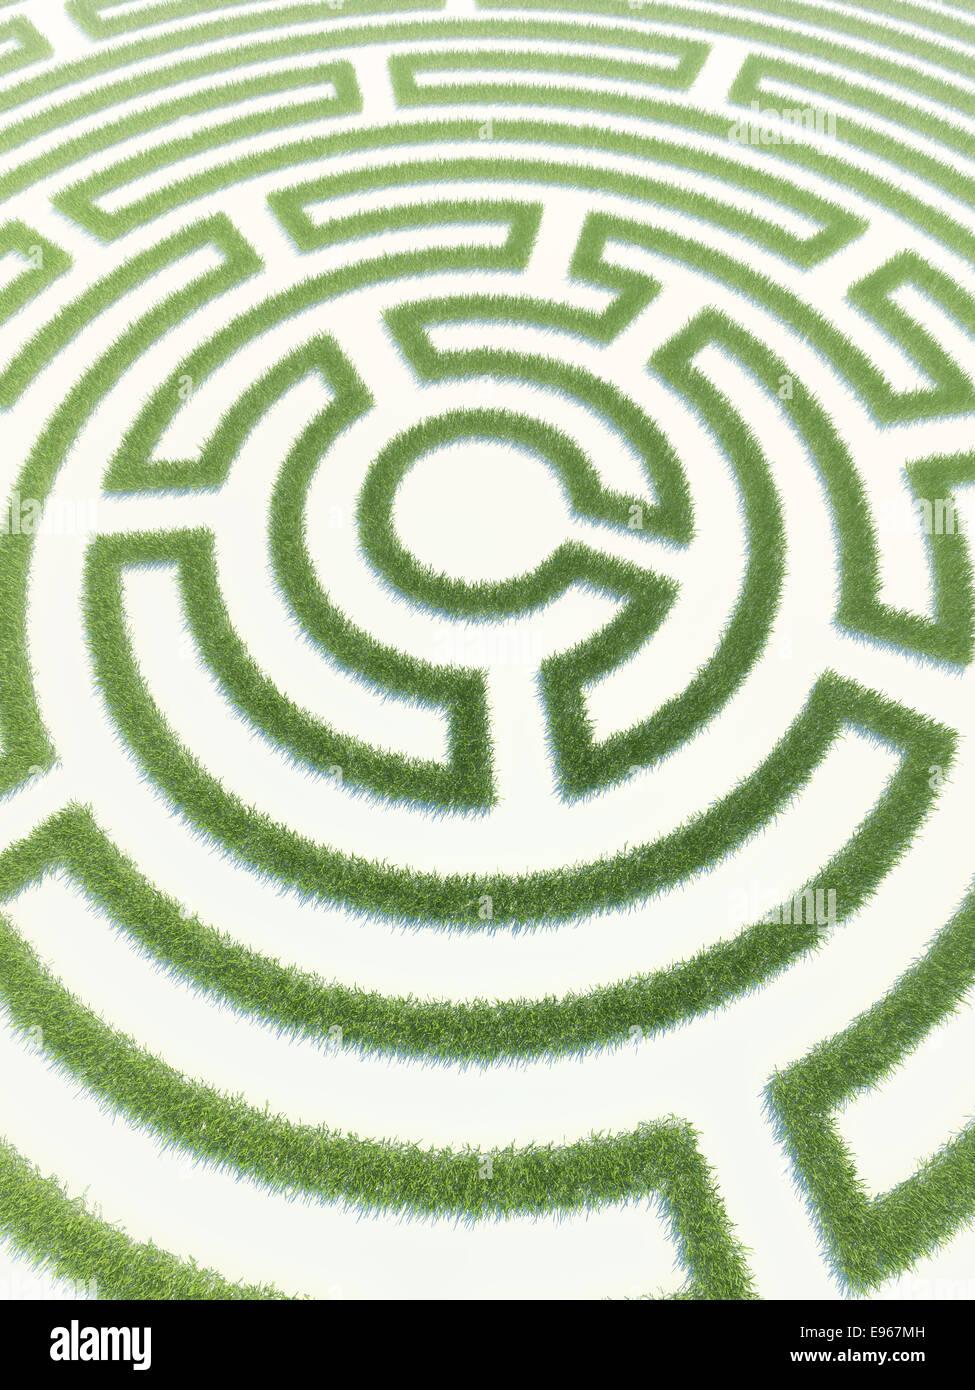 Labyrinthe en herbe Photo Stock